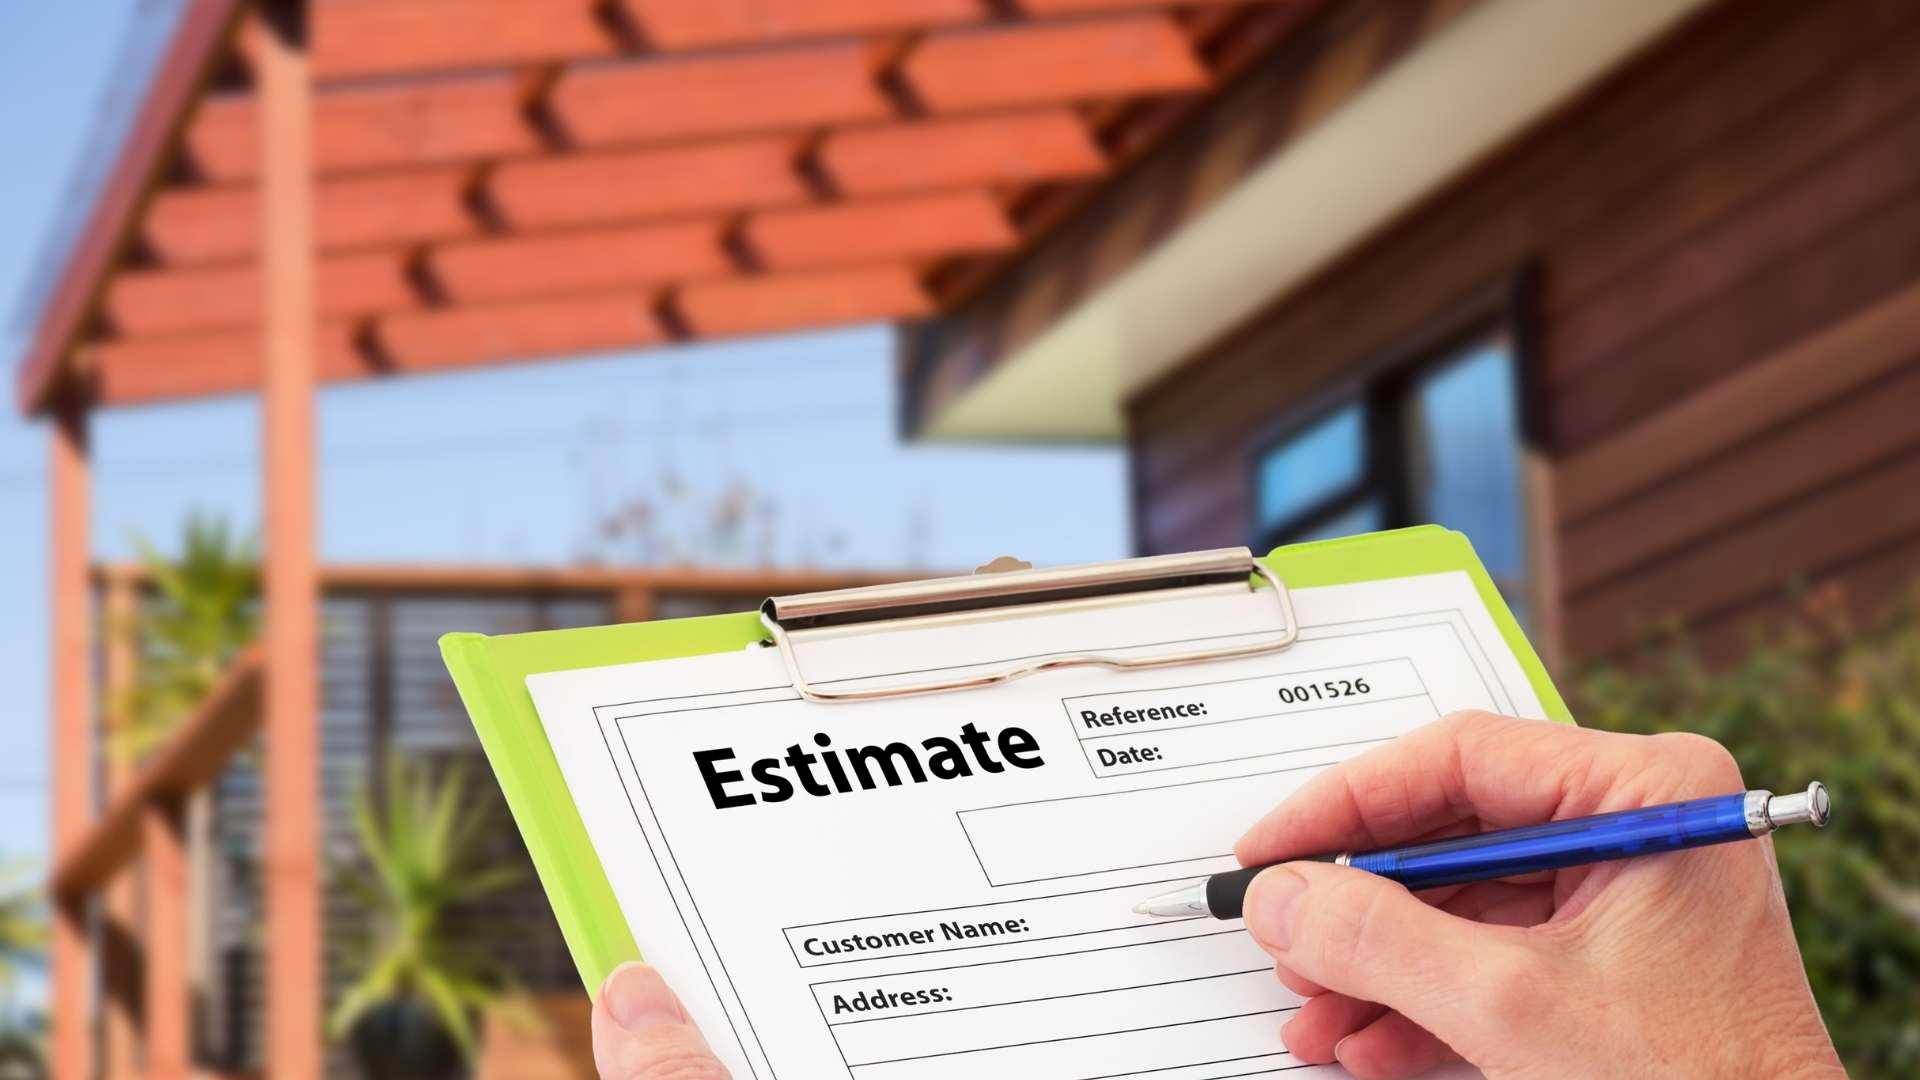 roofing companies near me free estimates